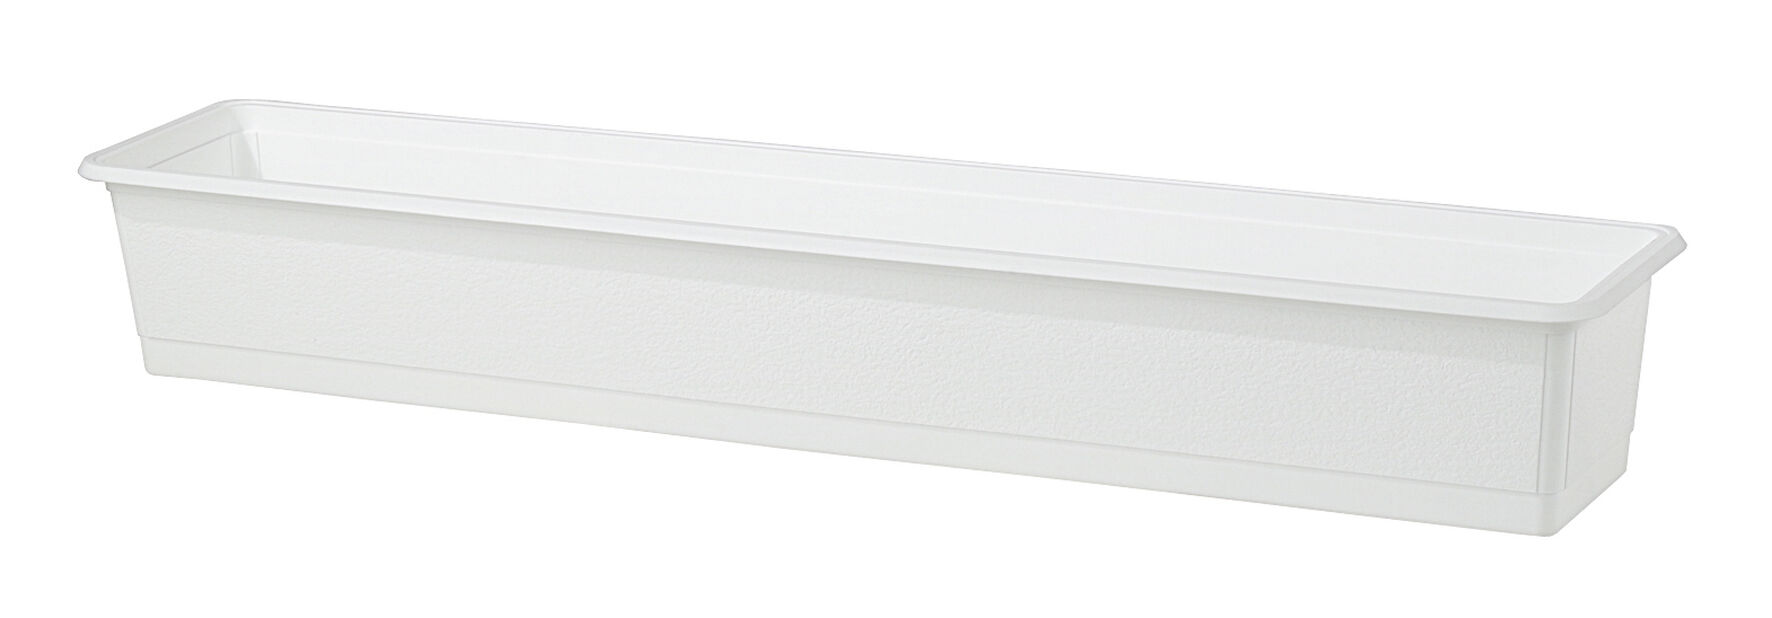 Balkonglåda Structure 70 cm